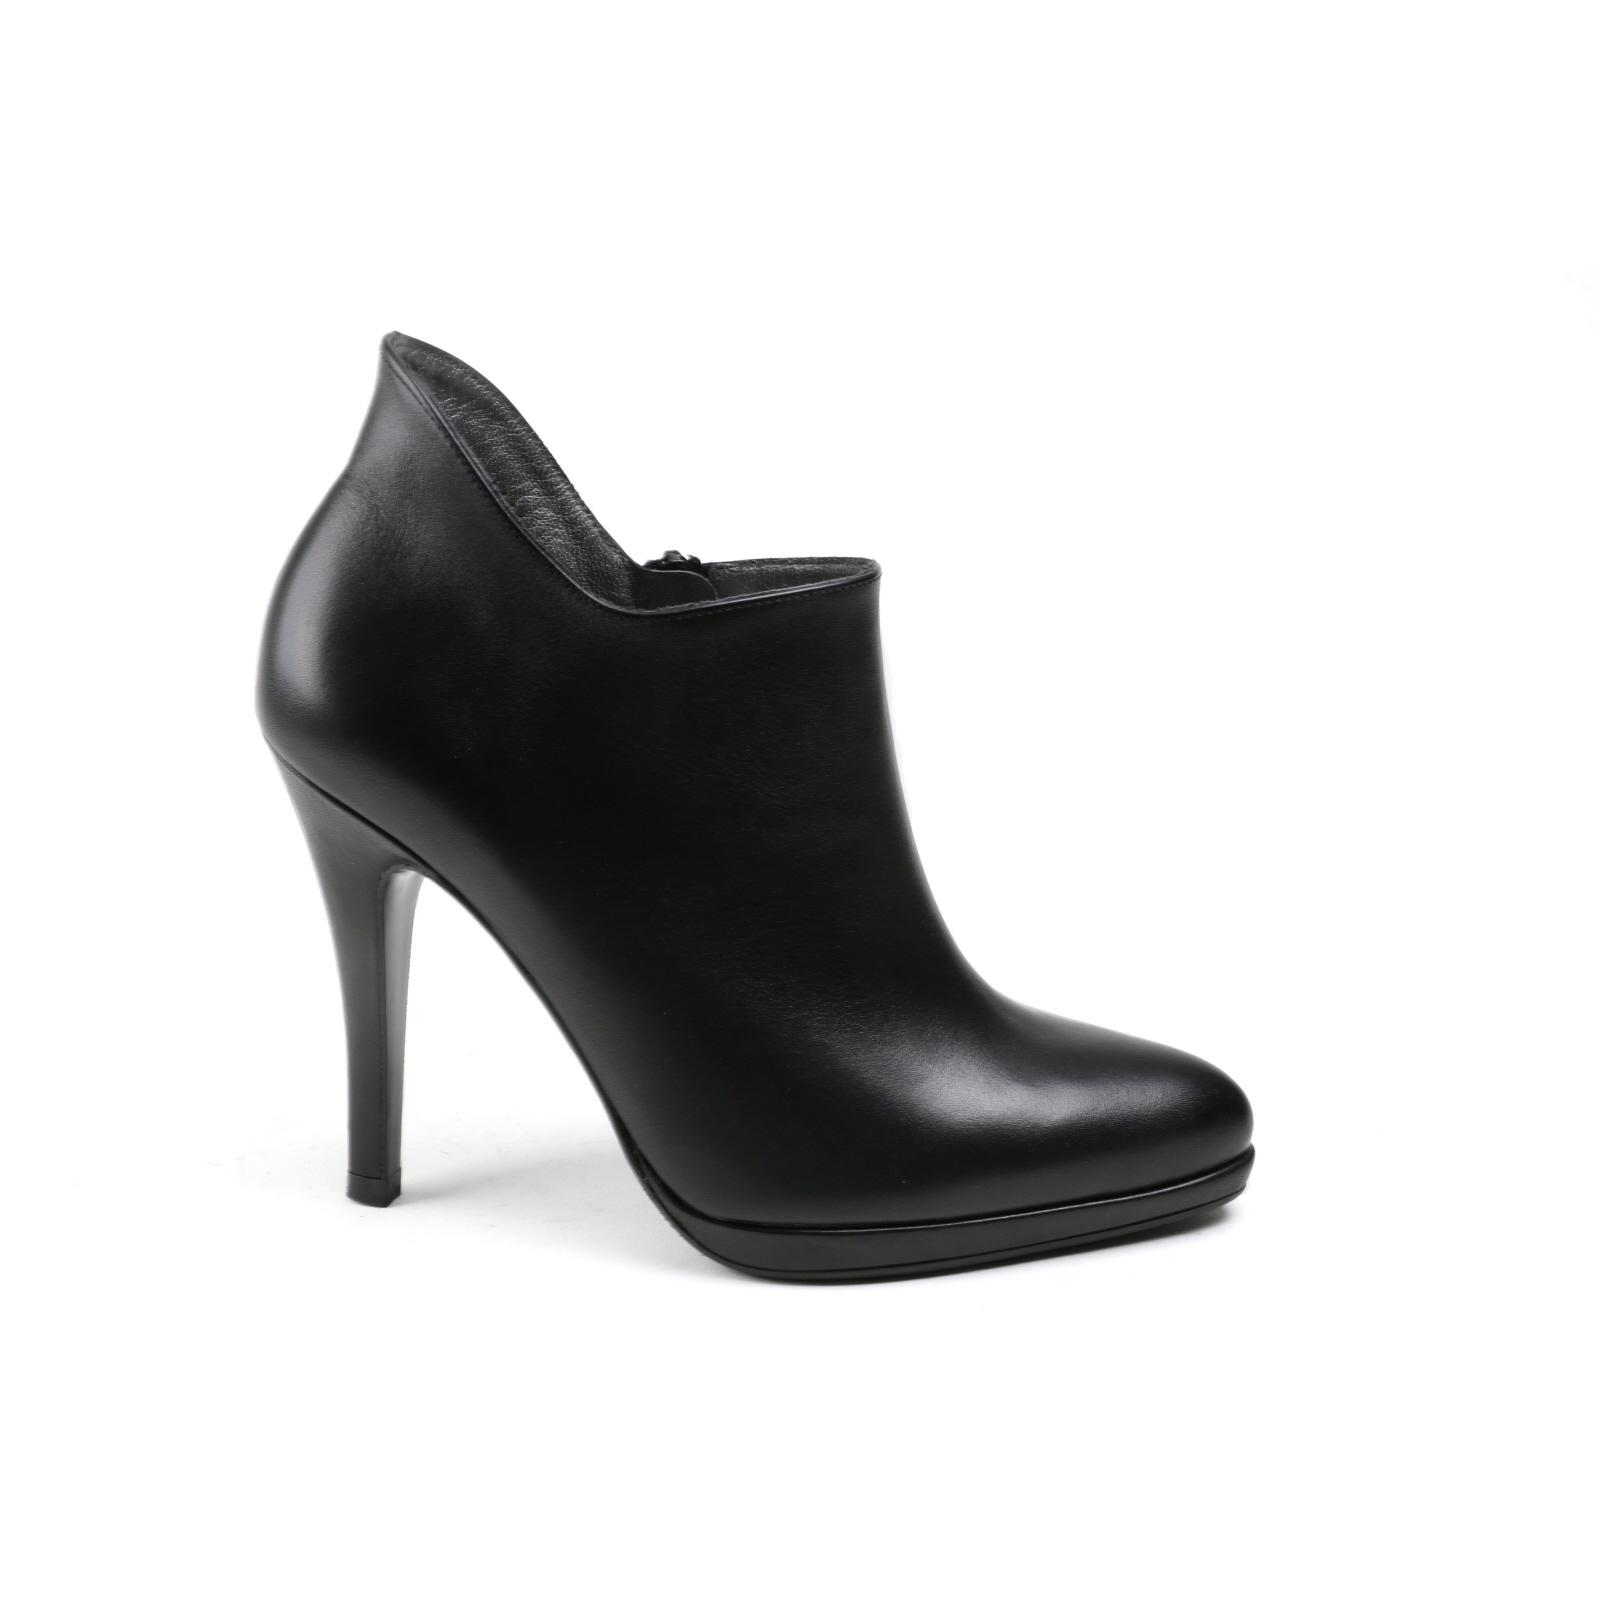 Damen Stiefelette Peter Kaiser Ankle Boots schwarz Glattleder NEU Gr.39